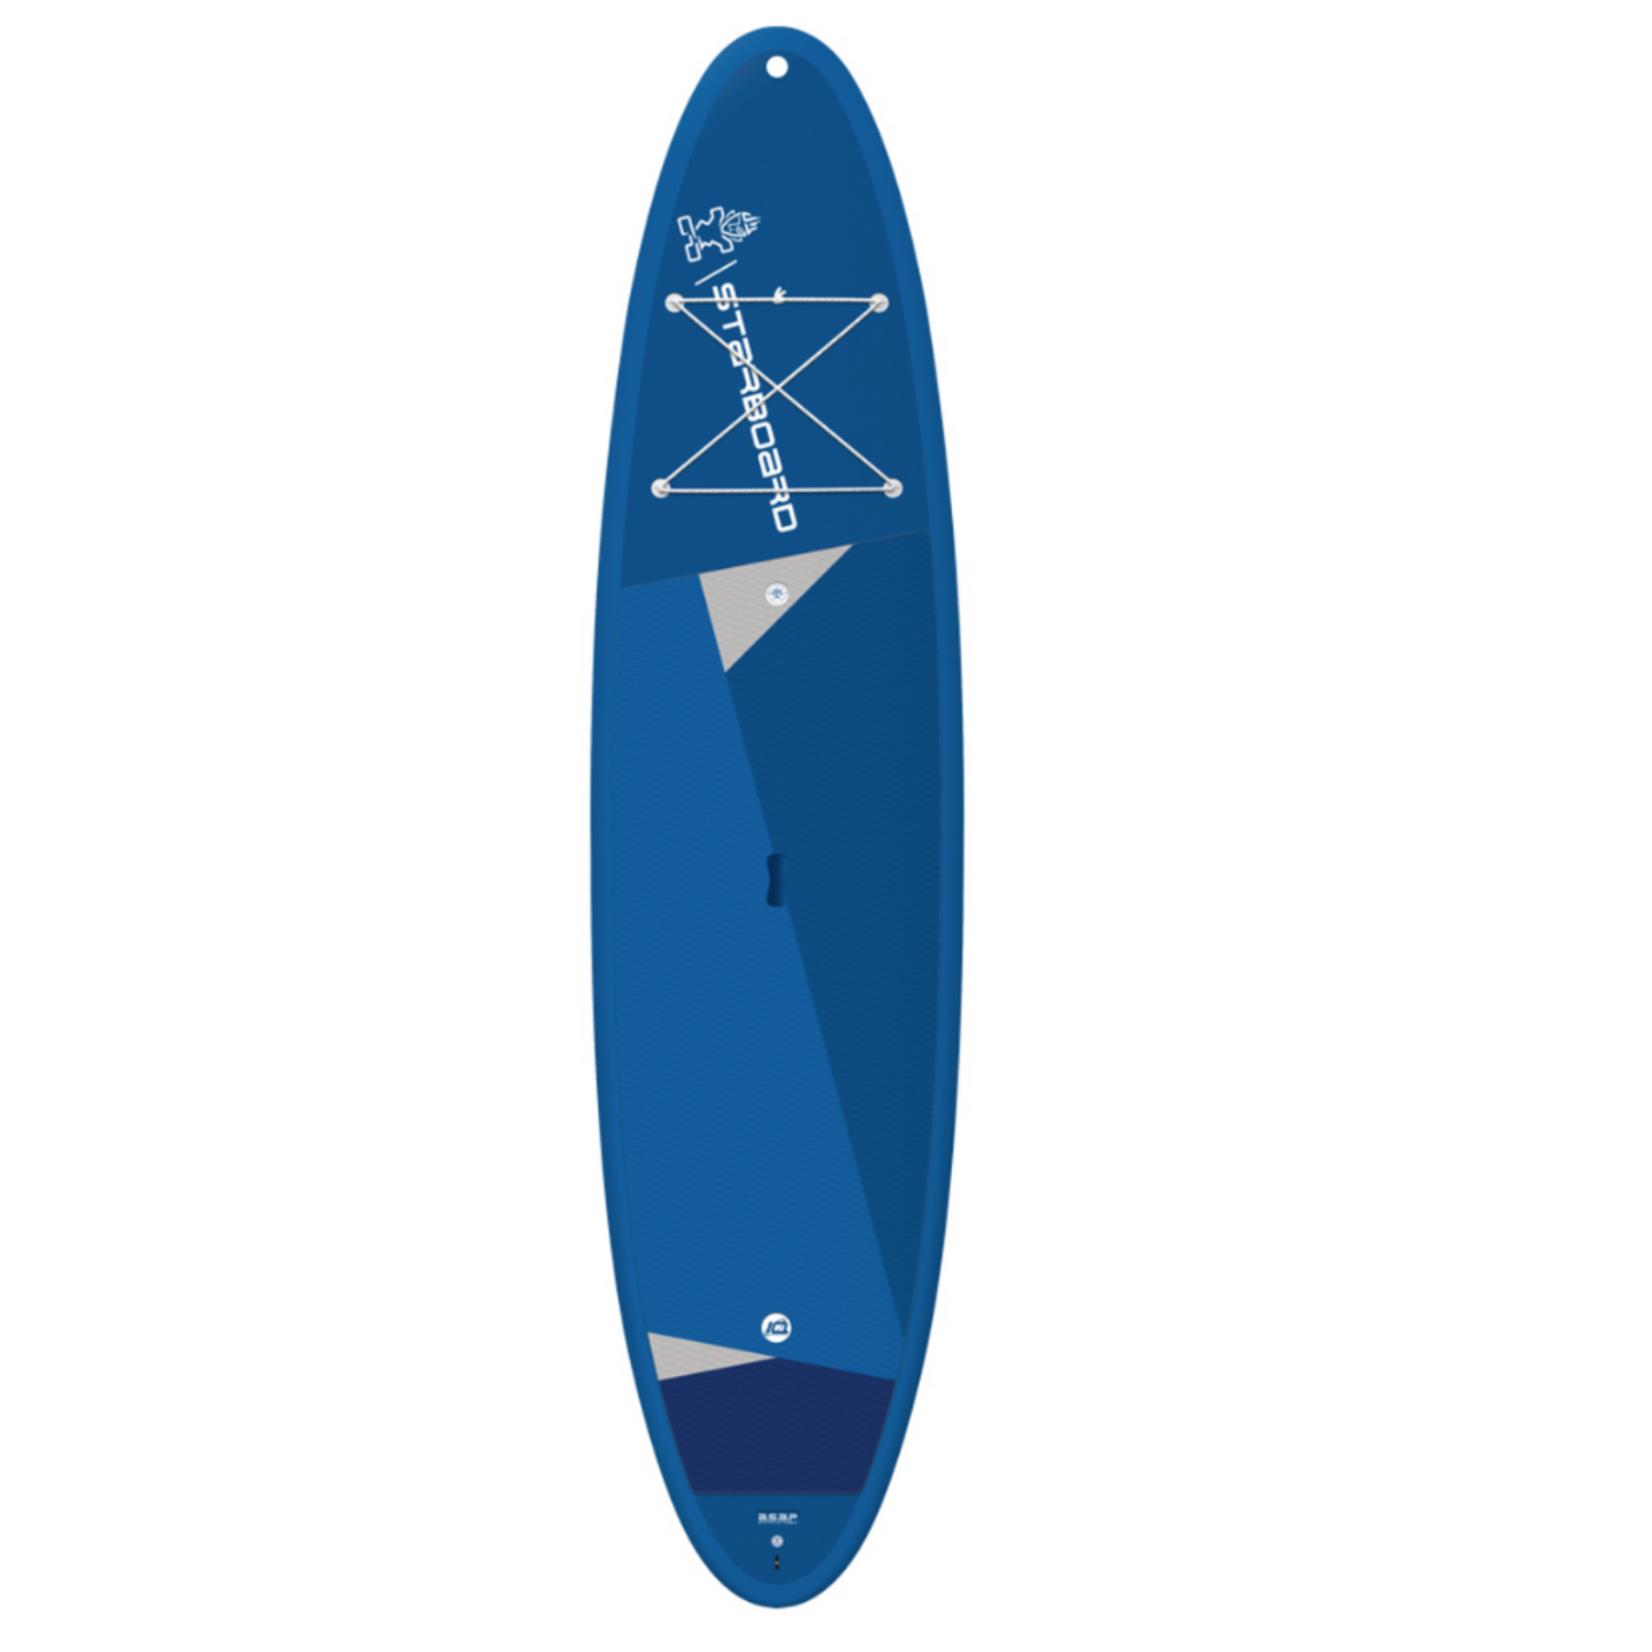 Starboard 2021 Starboard GO ASAP 10'8 x 31